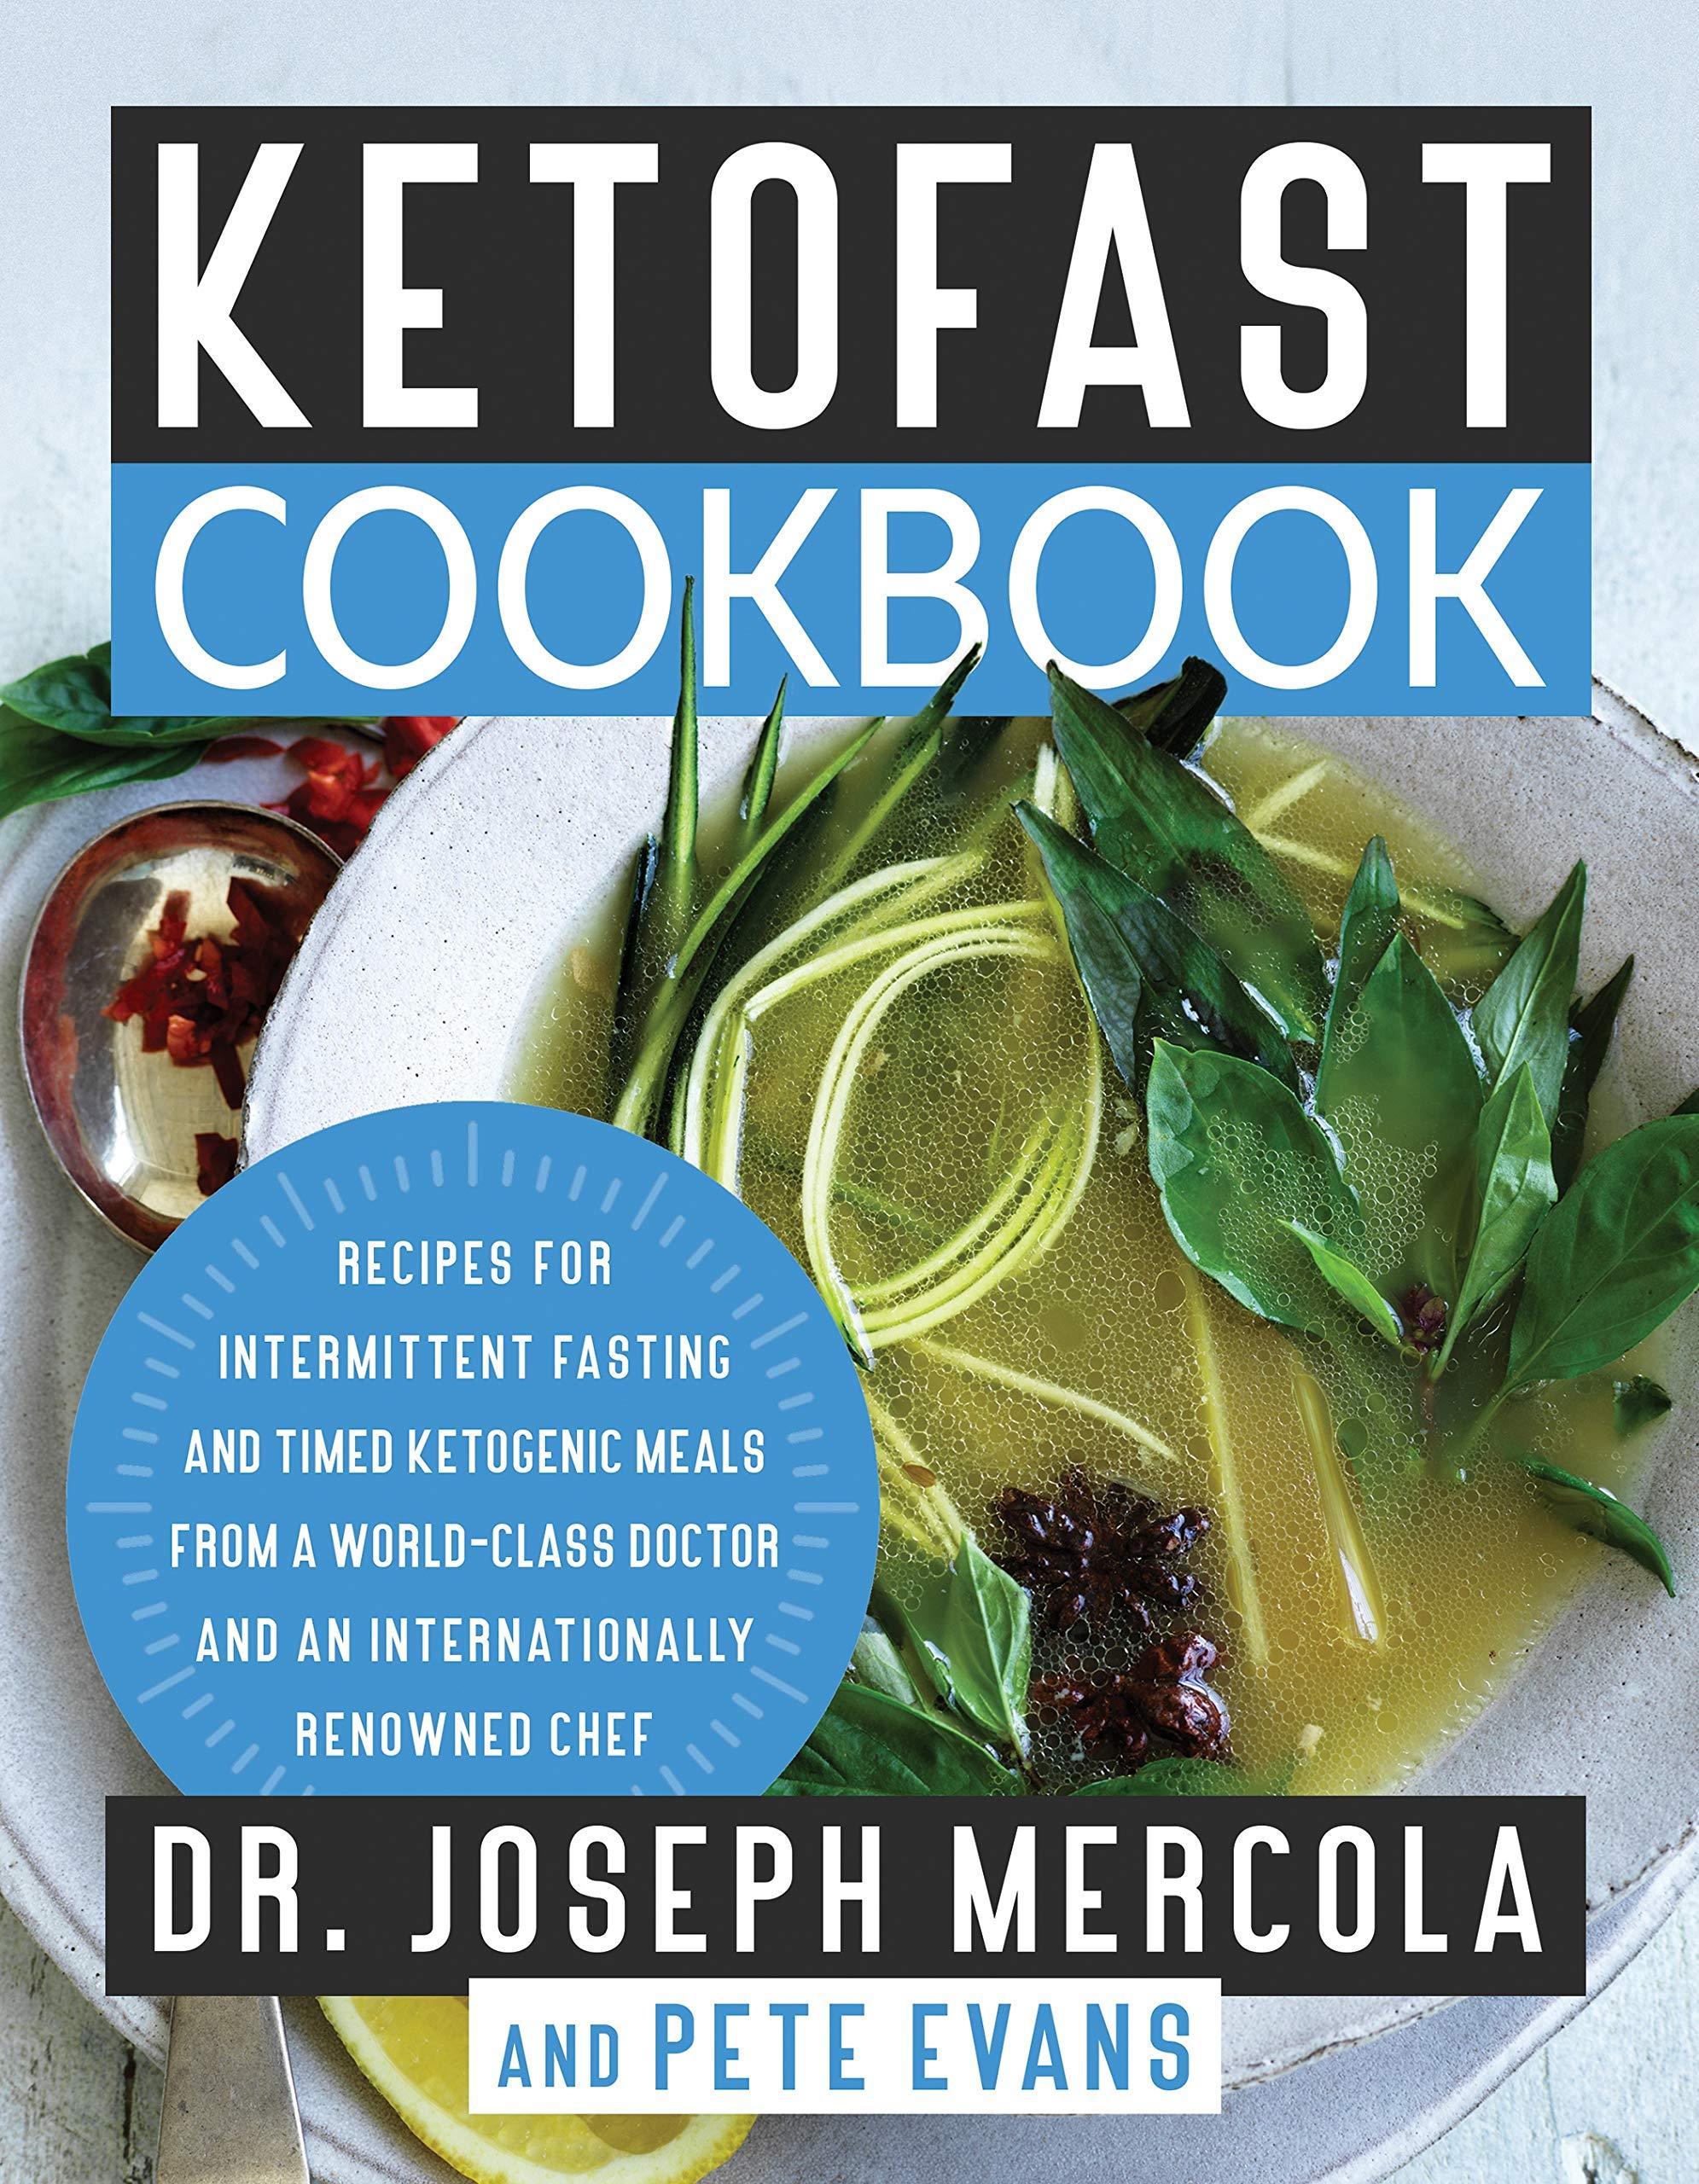 mercola ketogenic diet recipes